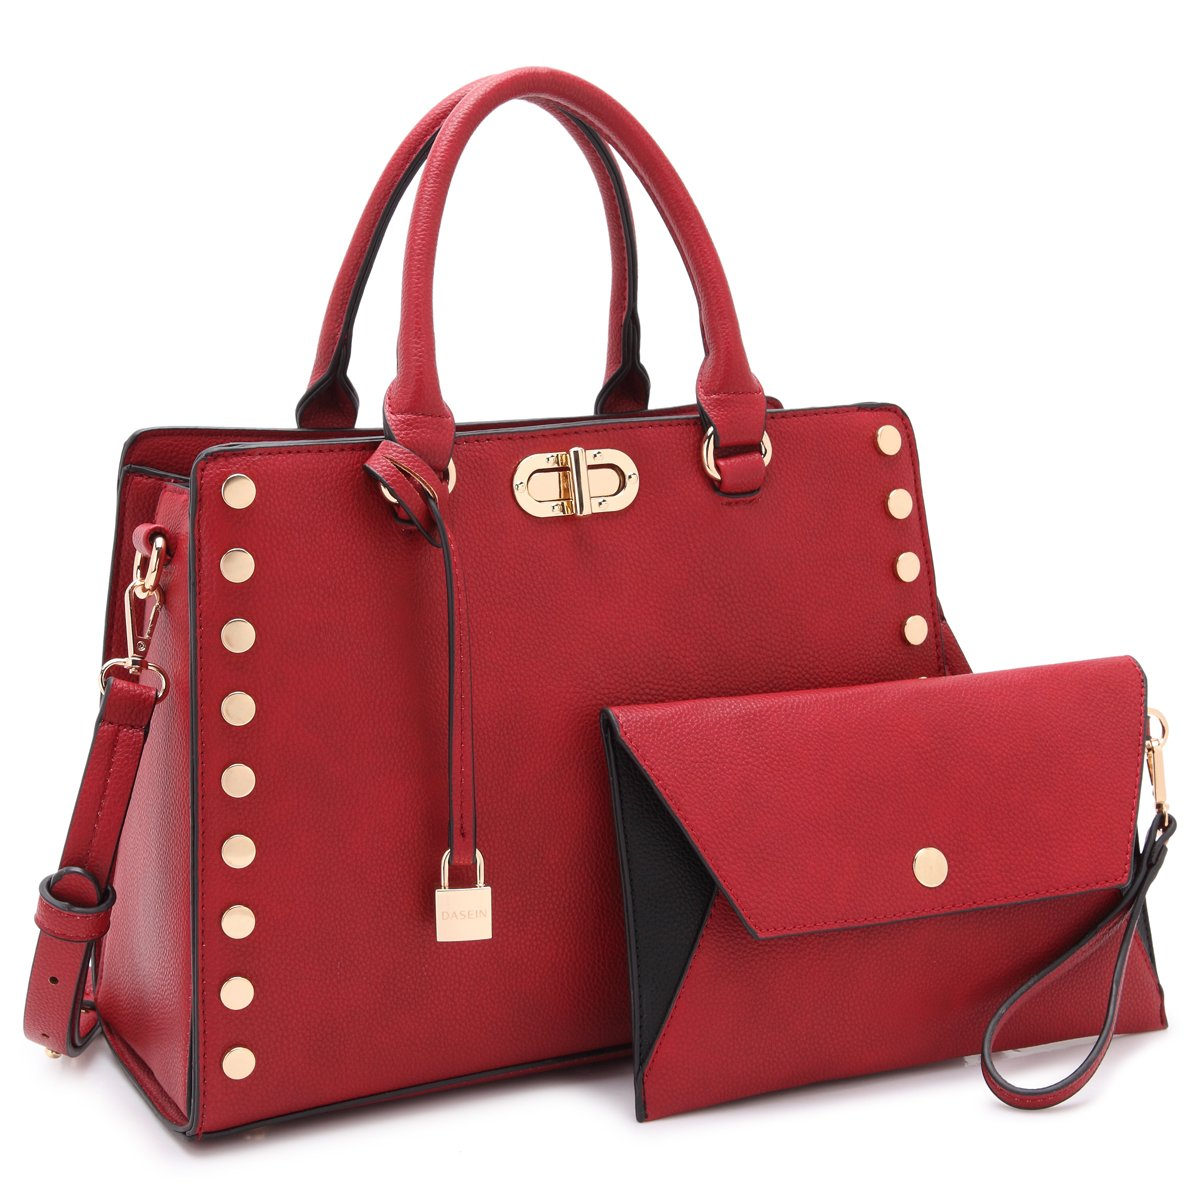 Designer Handbags Purses For Women Tassel Lock Satchel Bags Top Handle Shoulder Bag With Matching Wallet